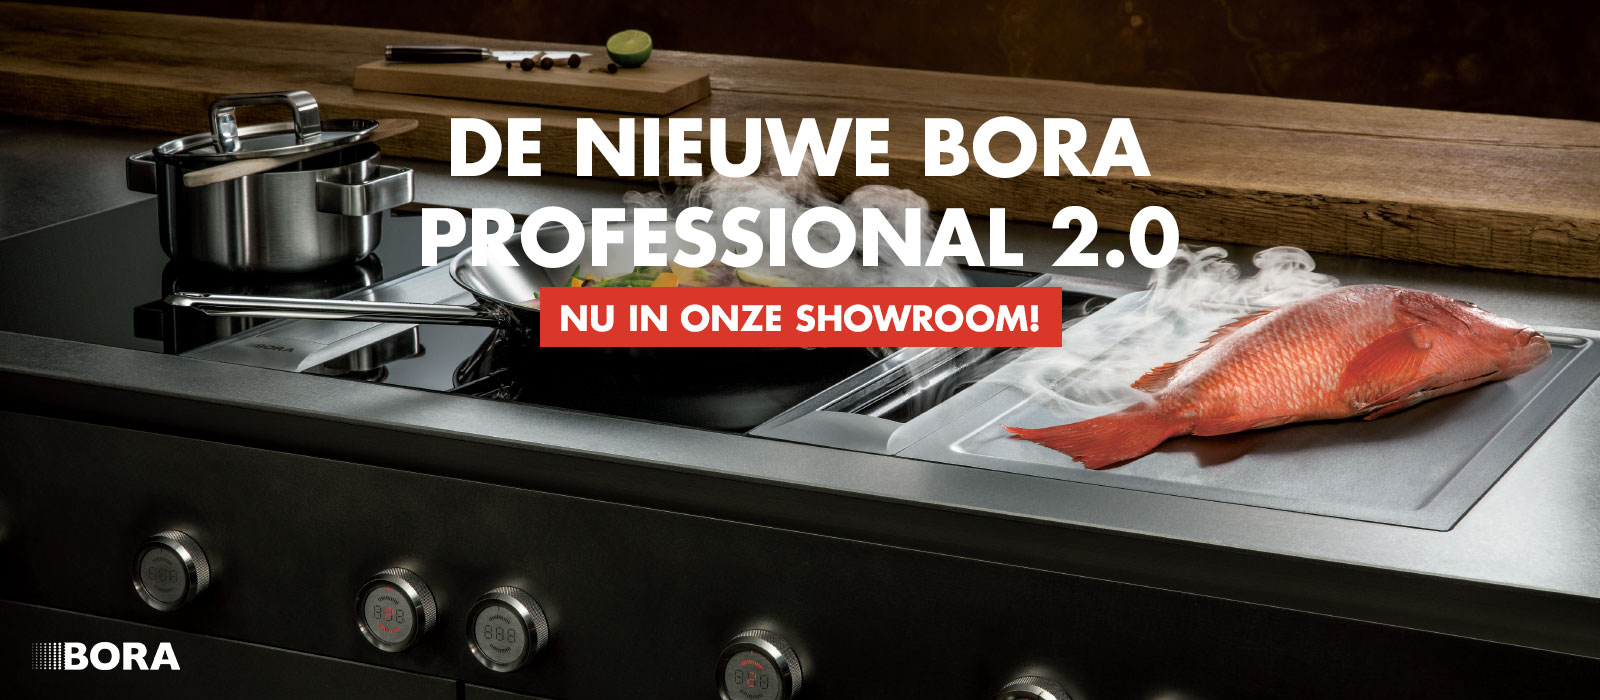 Bora Professional 2.0 bladafzuigsysteem